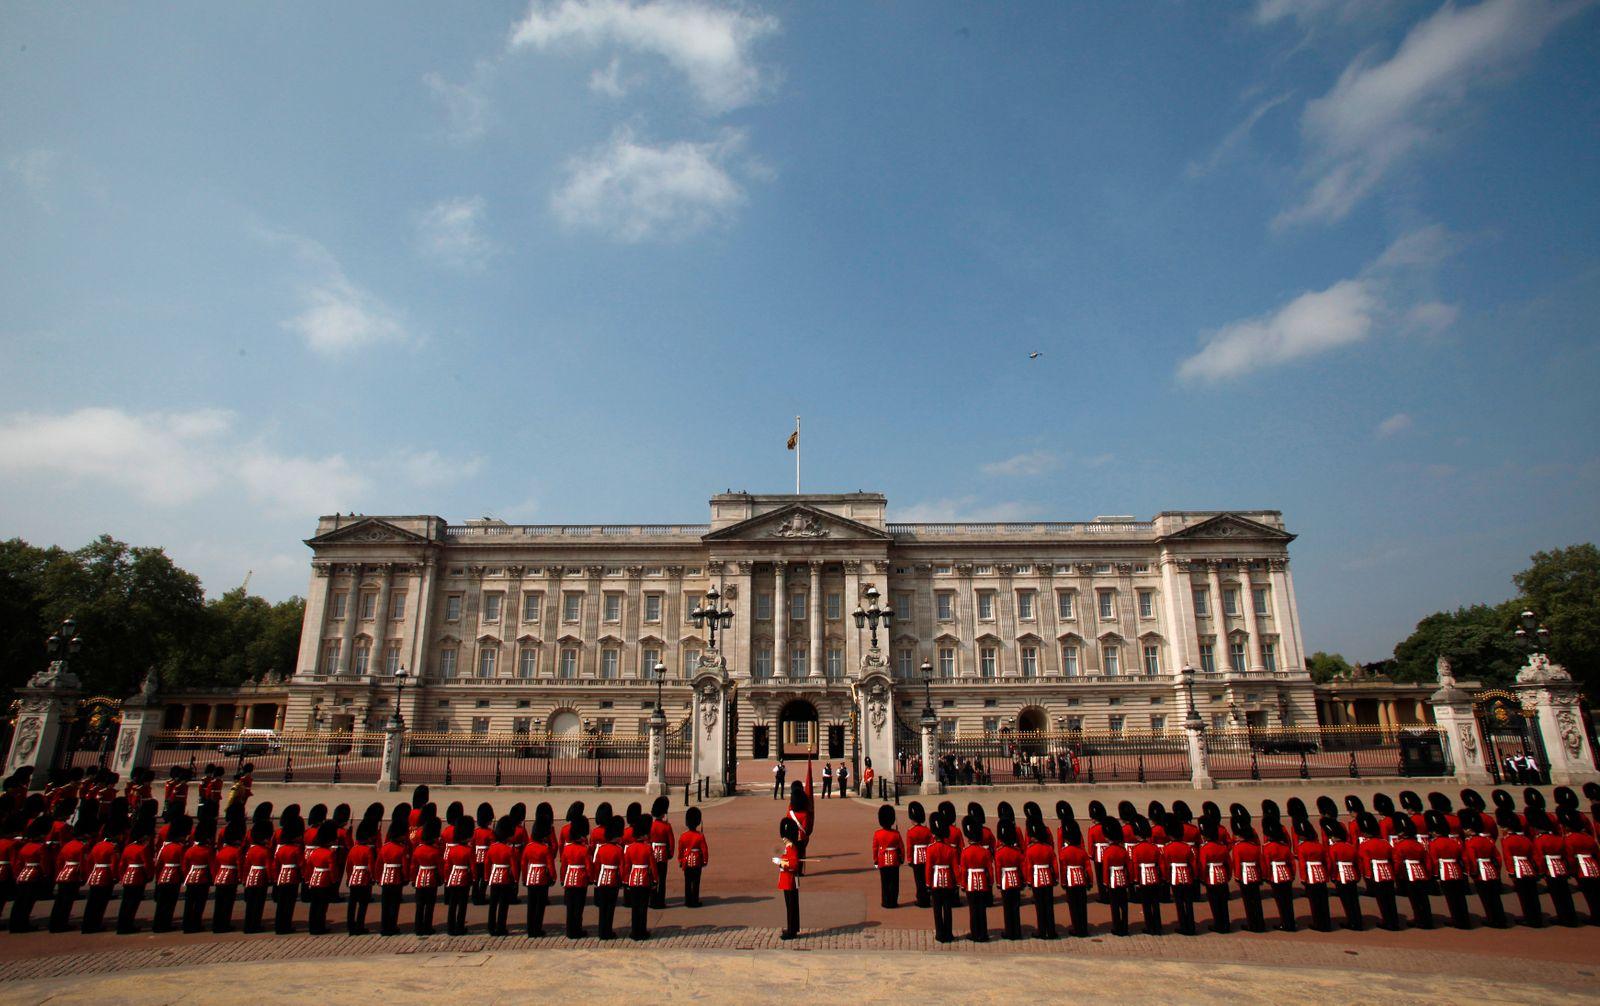 Großbritannien / Buckingham Palace